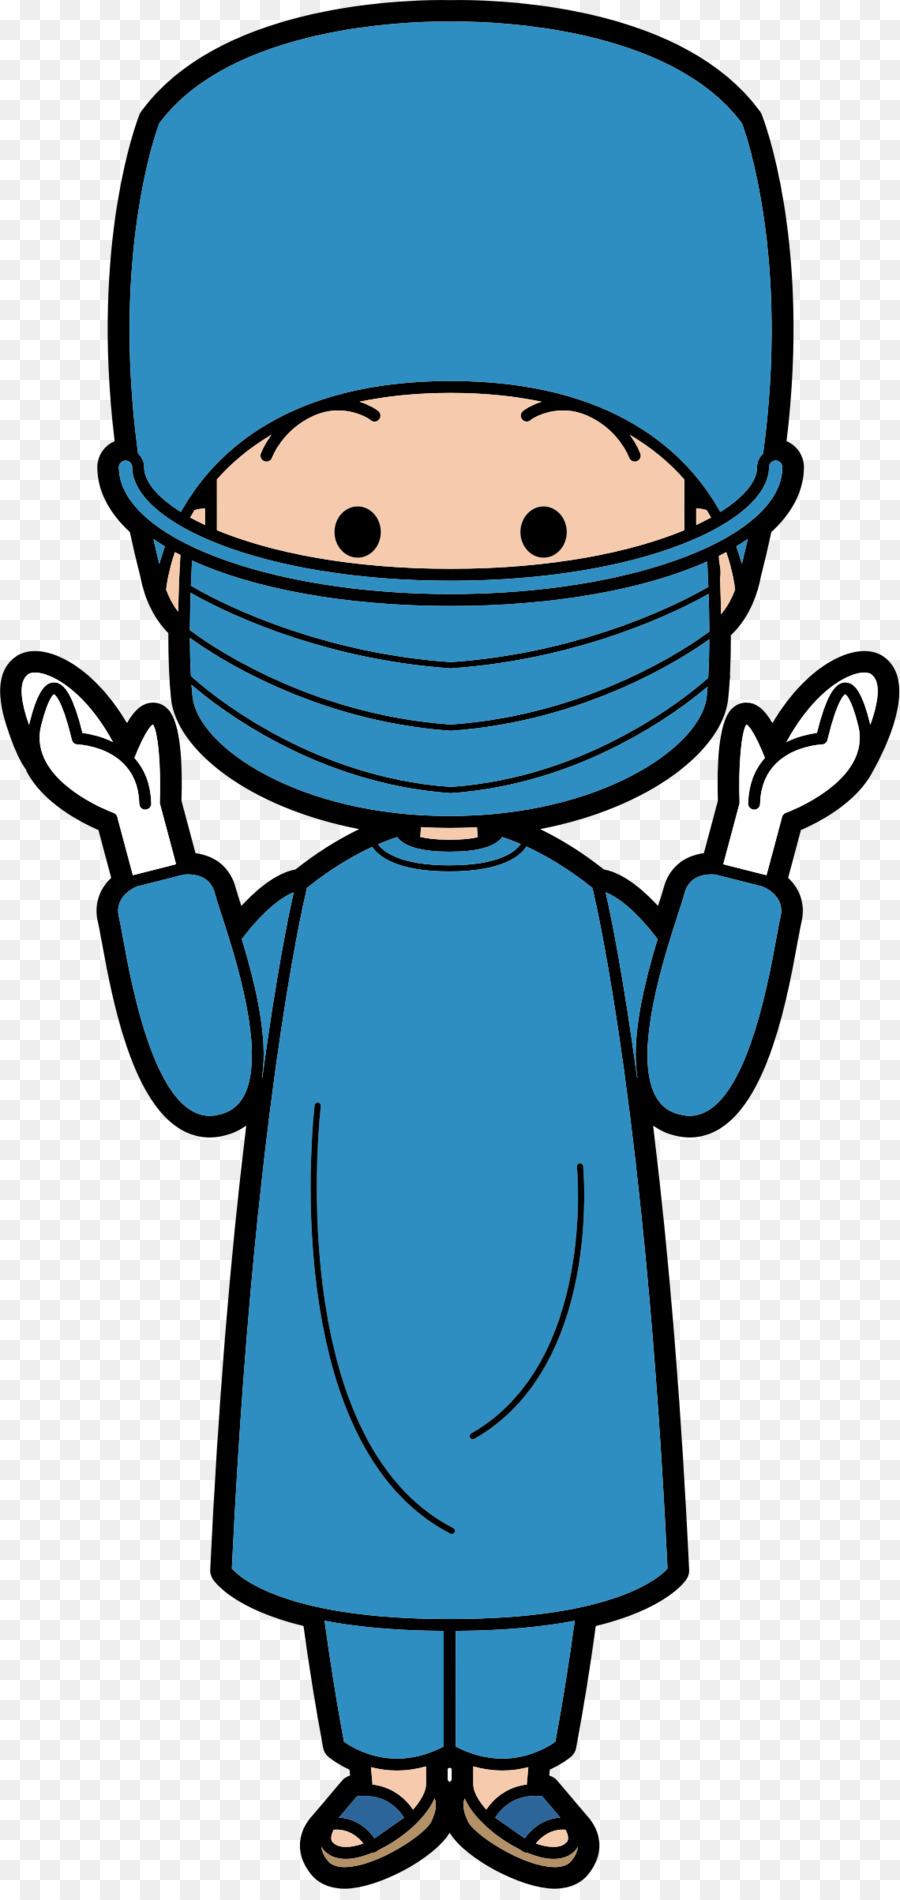 Surgen clipart jpg freeuse stock Medicine Cartoon clipart - Line, Product, Graphics ... jpg freeuse stock